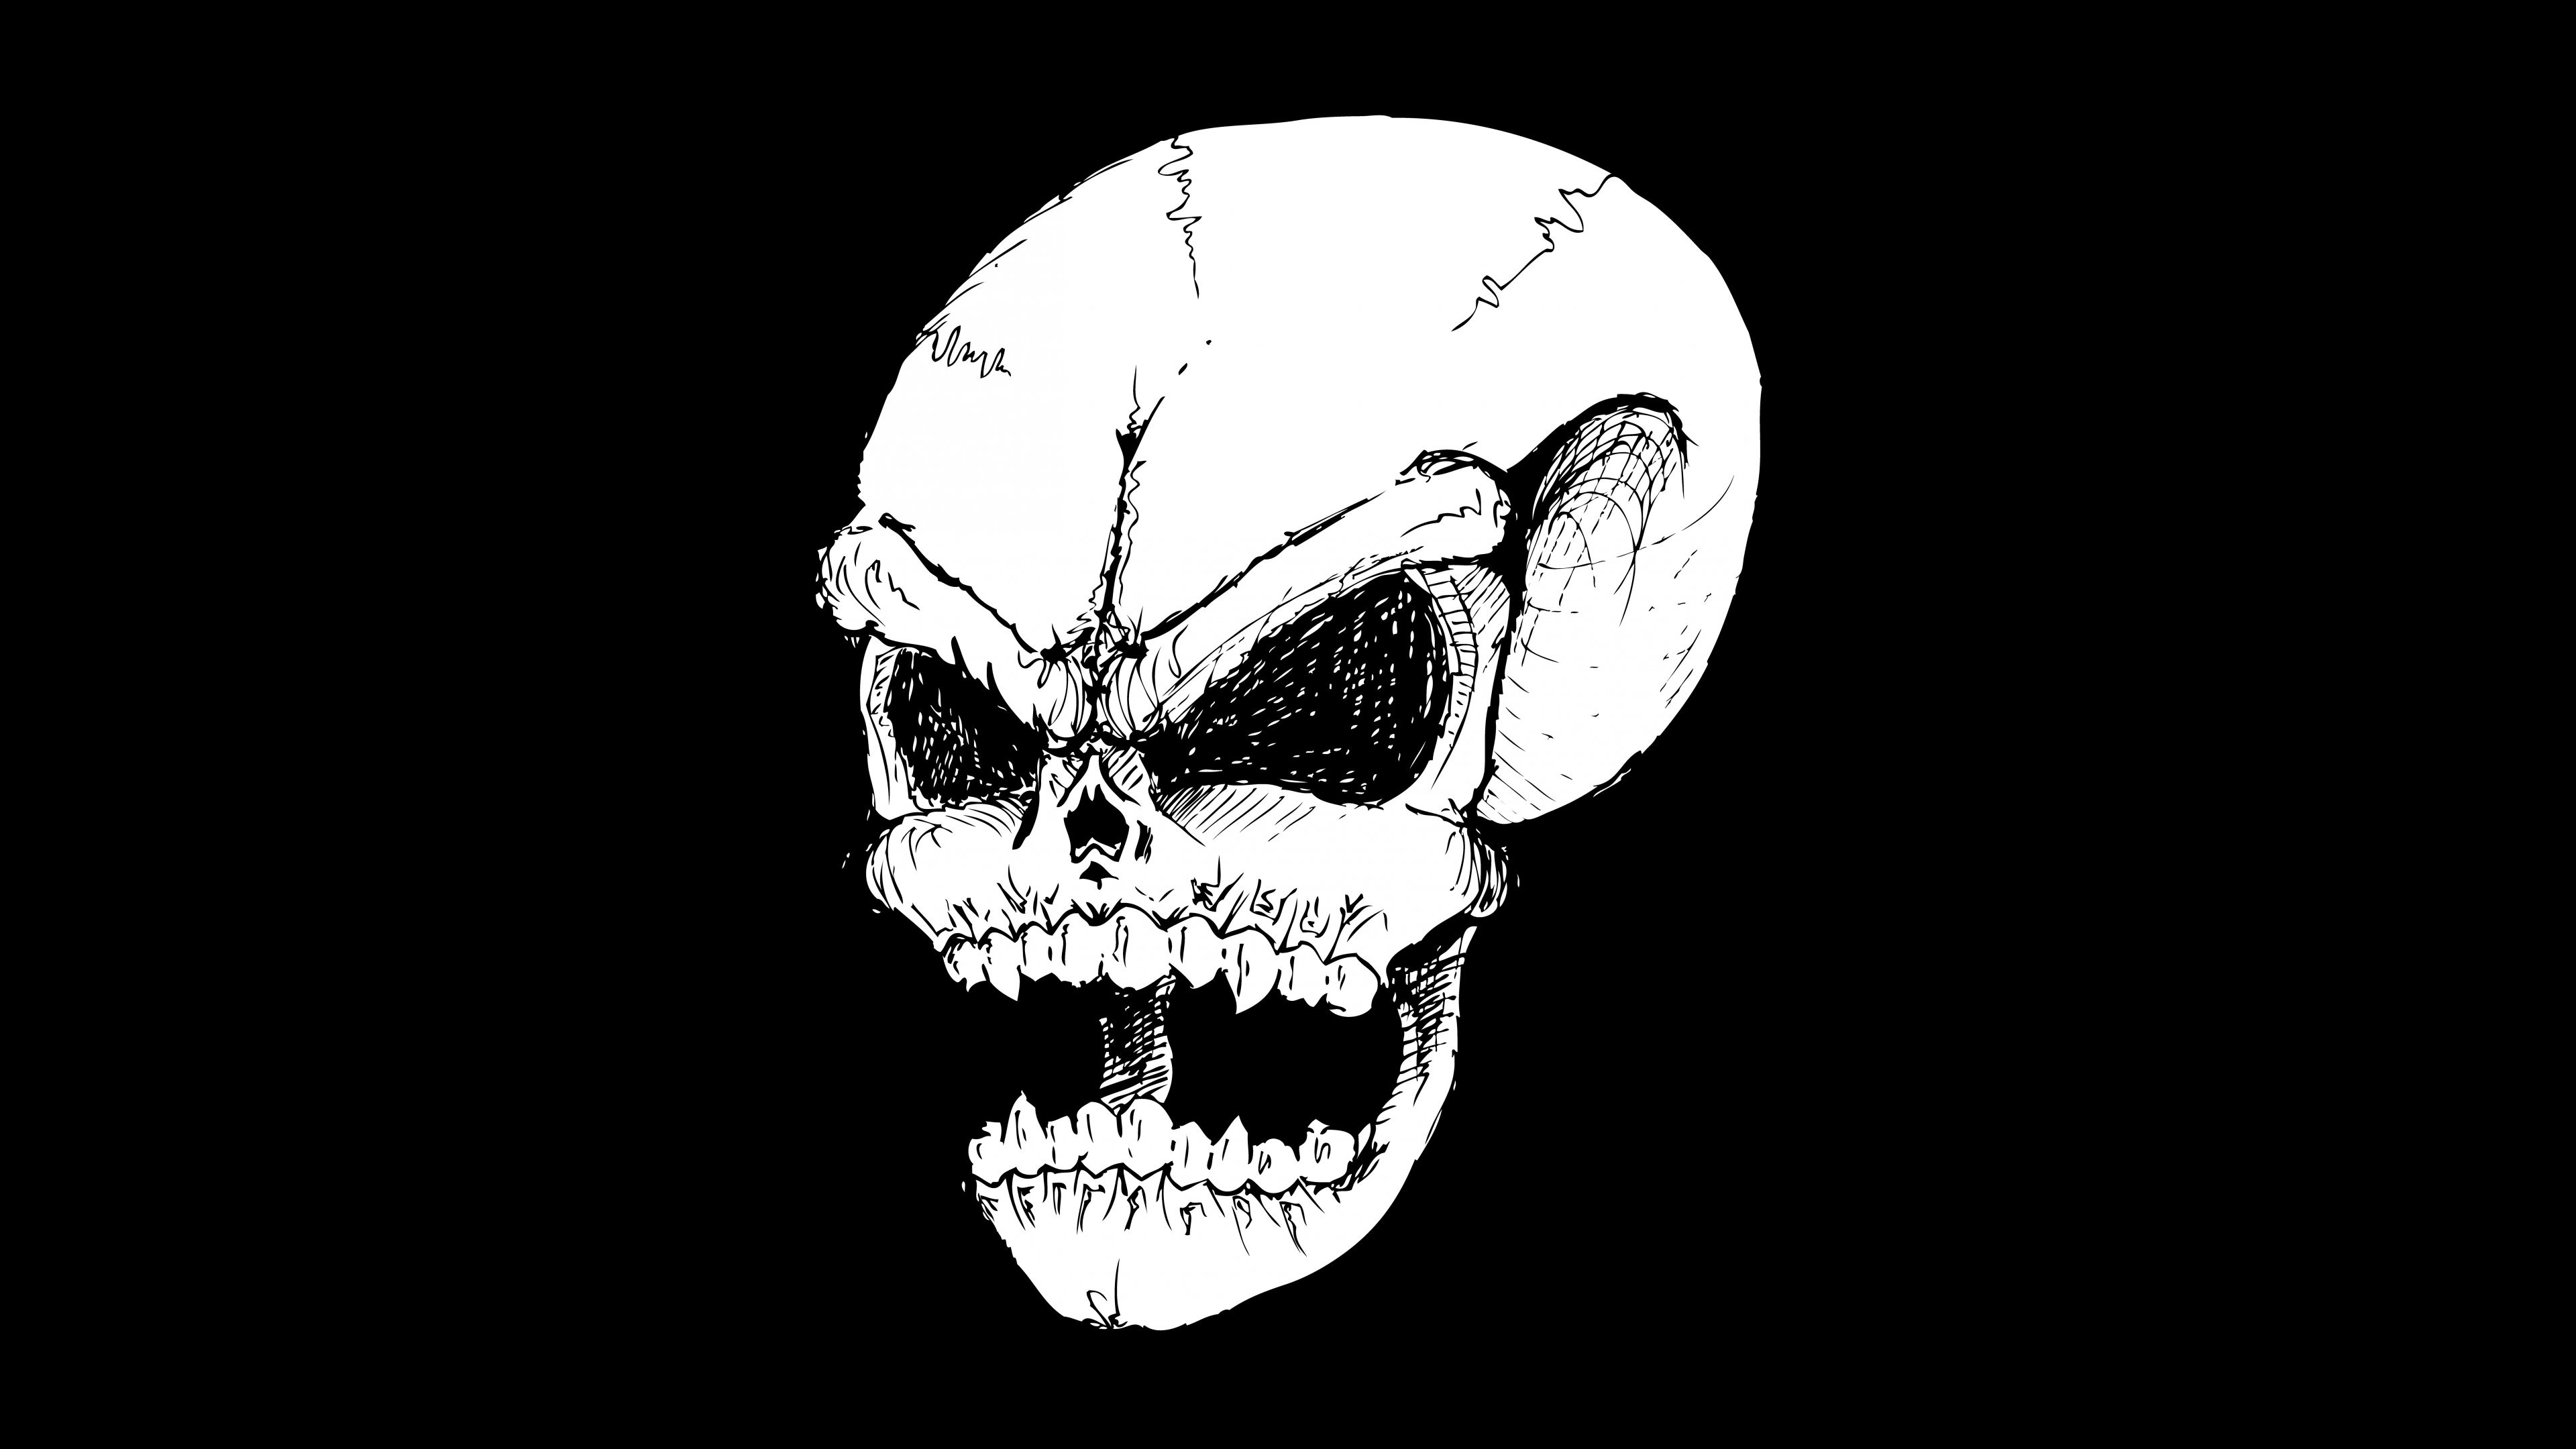 evil skull wallpaper  u00b7 u2460 wallpapertag